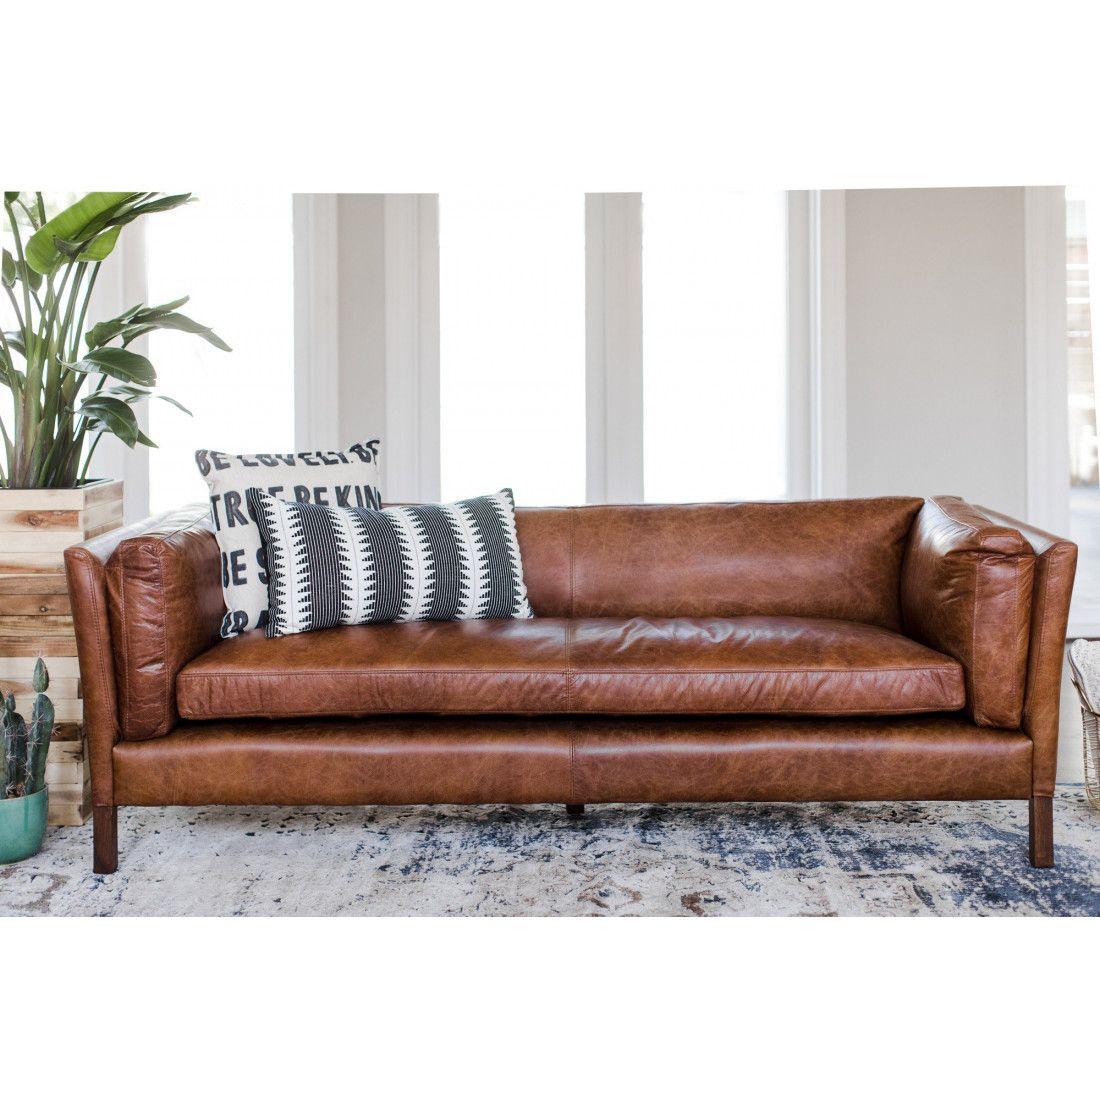 Admirable Finley Leather Sofa Living Room Modern Leather Sofa Inzonedesignstudio Interior Chair Design Inzonedesignstudiocom